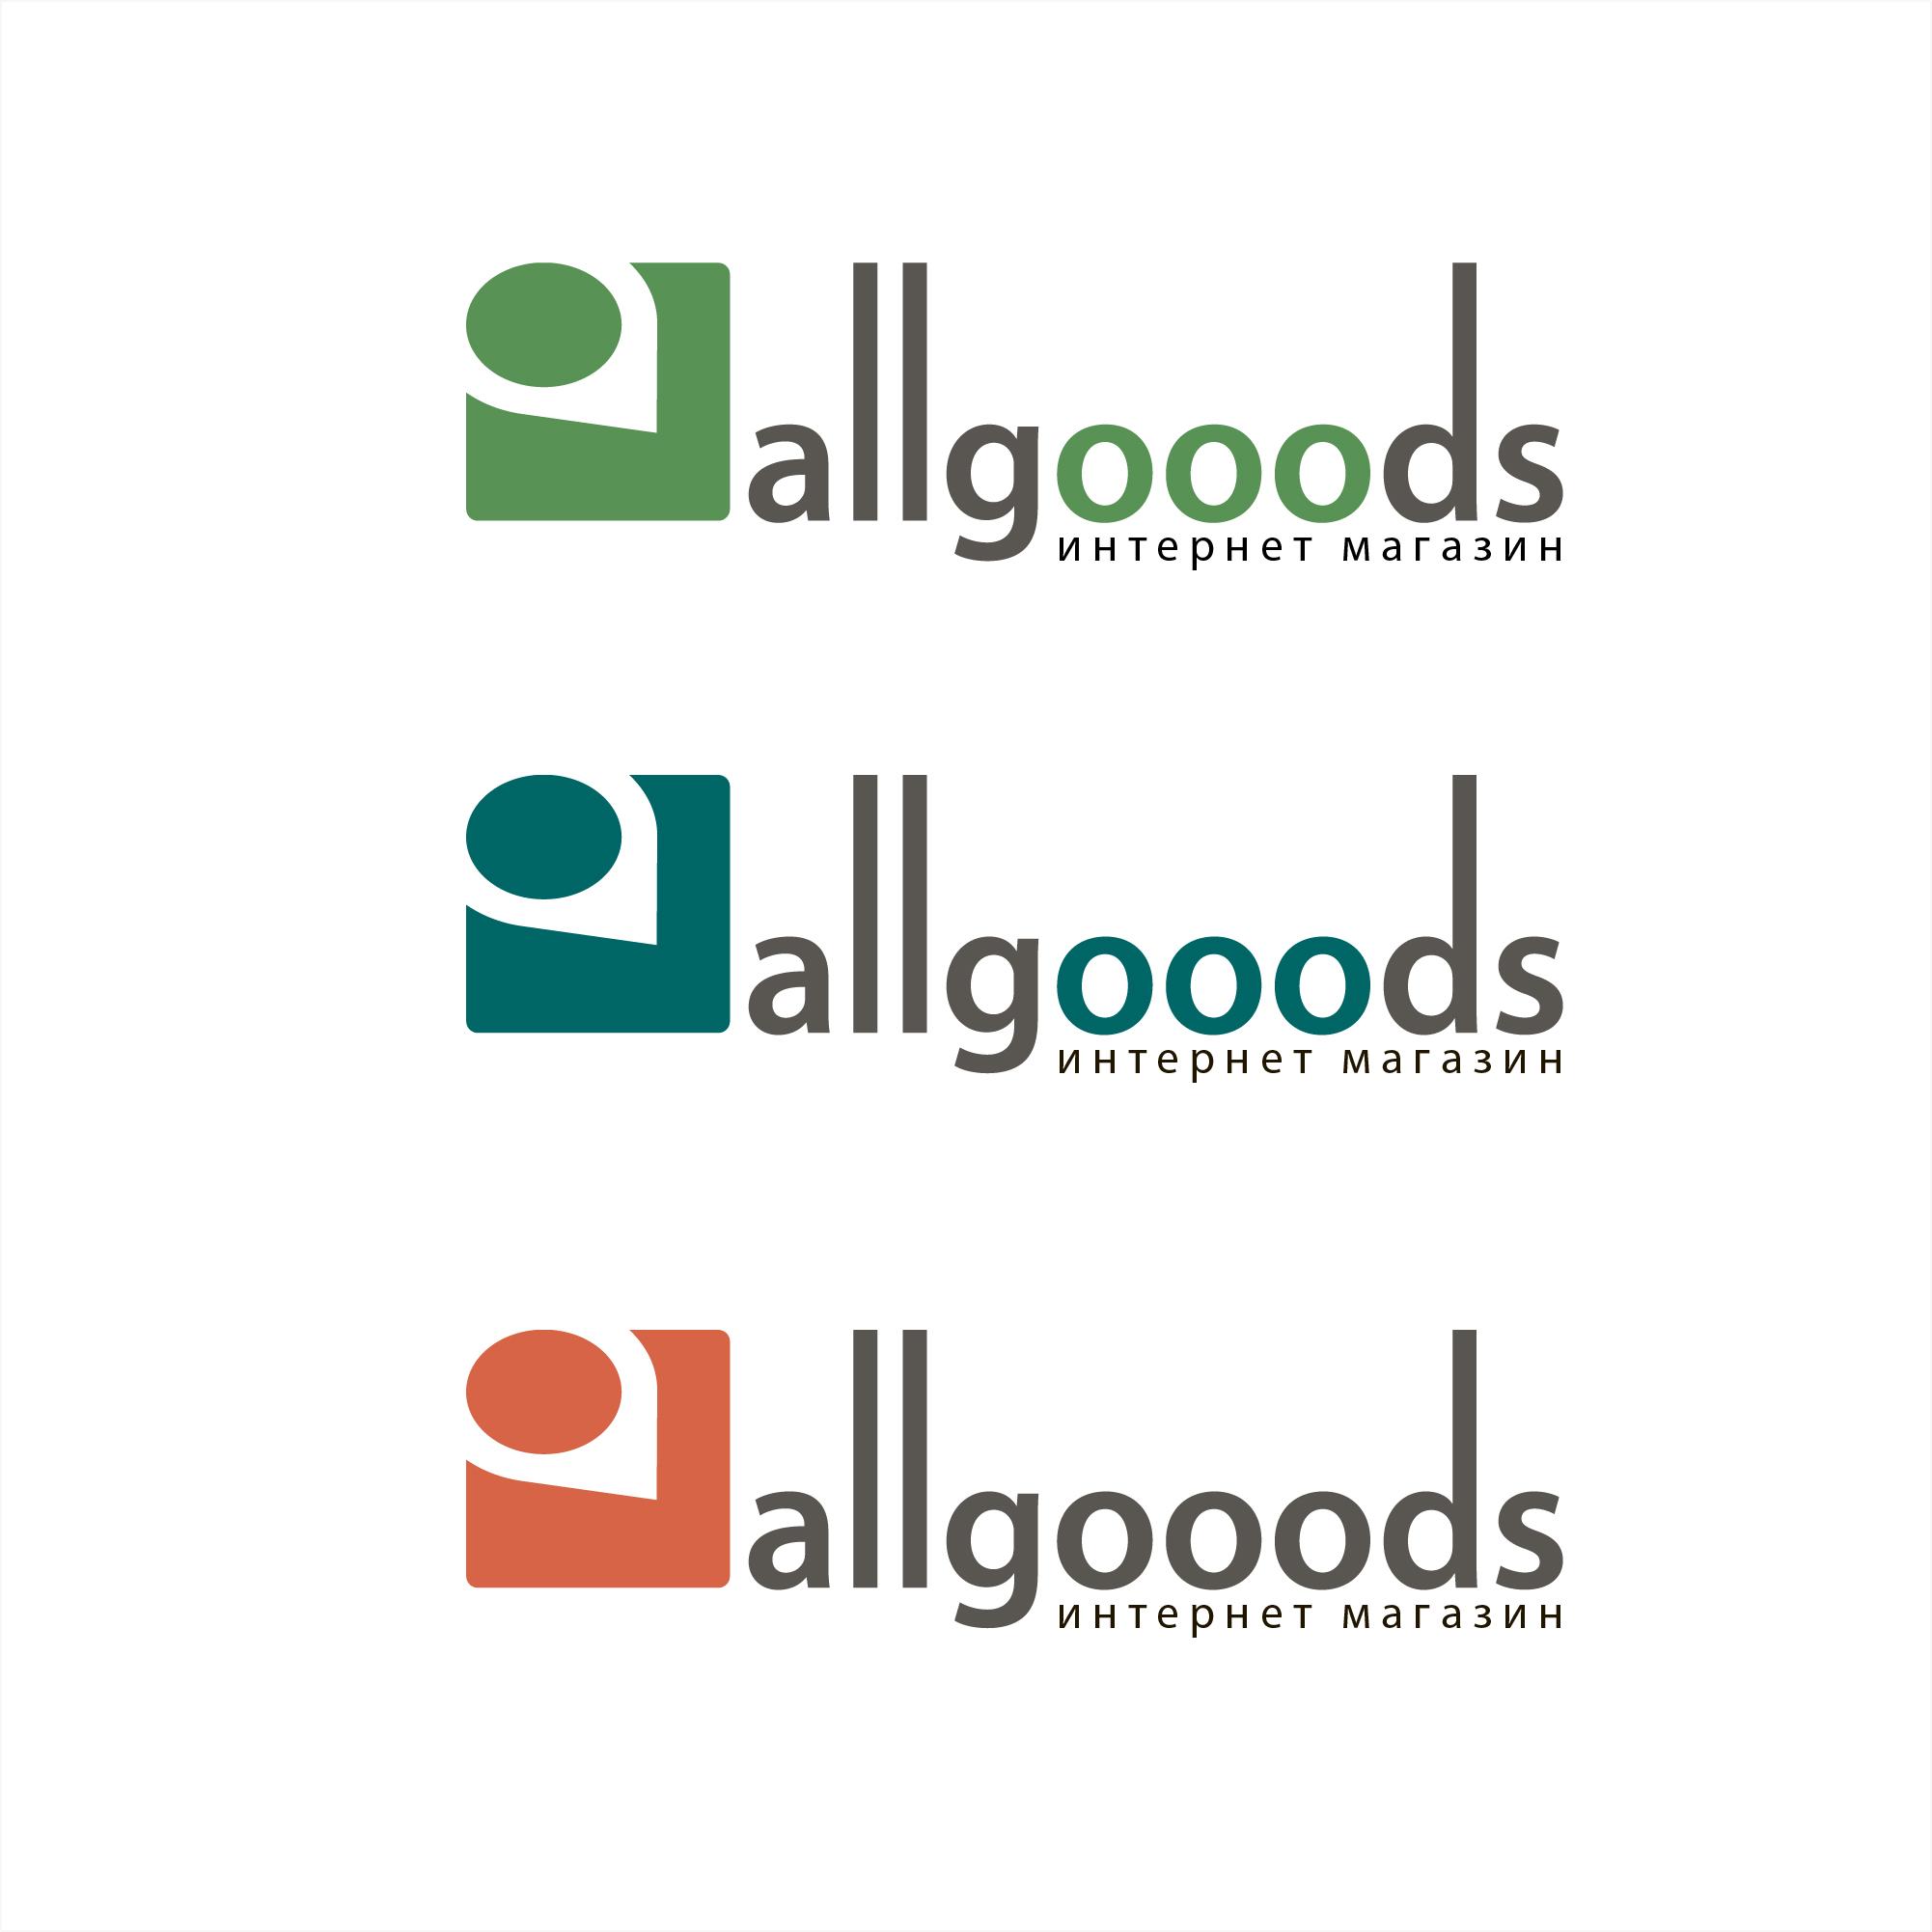 Необходимо разработать логотип фото f_61056c60a3805a52.jpg